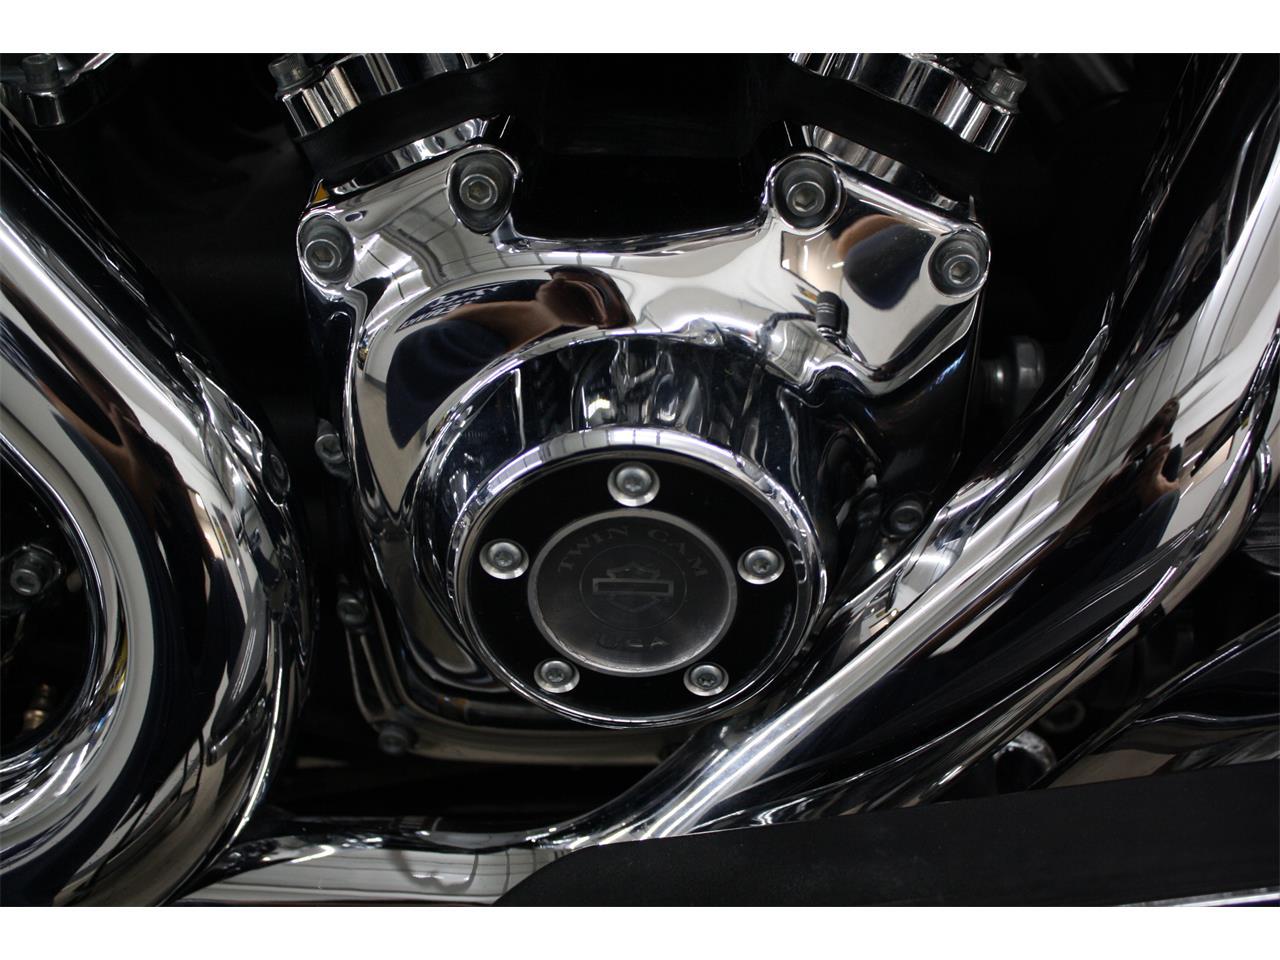 2015 Harley-Davidson Road Glide (CC-1411397) for sale in Tucson, Arizona